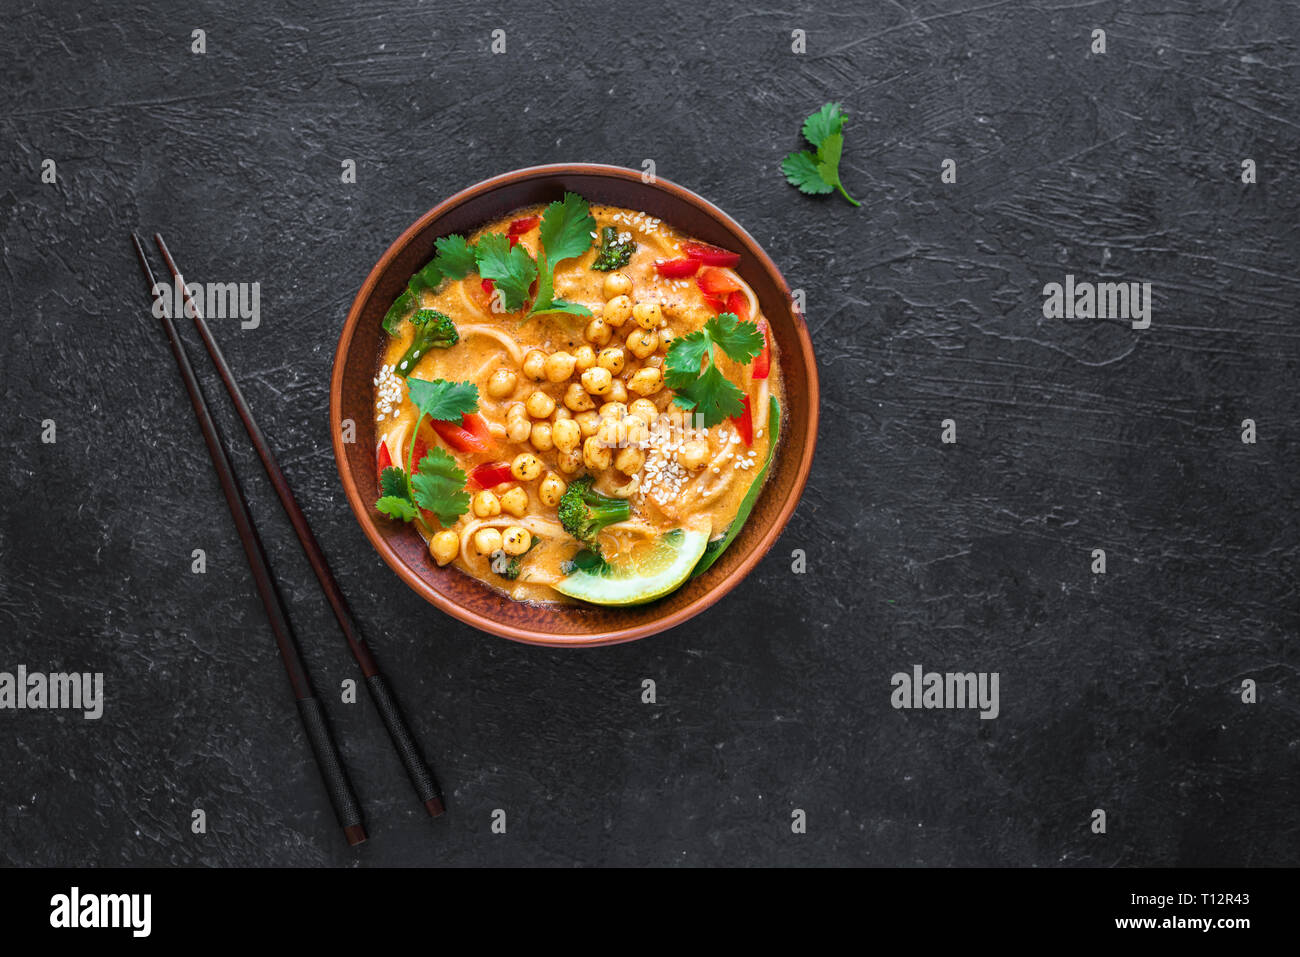 Laksa Soup Vegetable Noodle Laksa Soup On Black Background Top View Copy Space Asian Malaysian Vegan Vegetarian Food Stock Photo Alamy